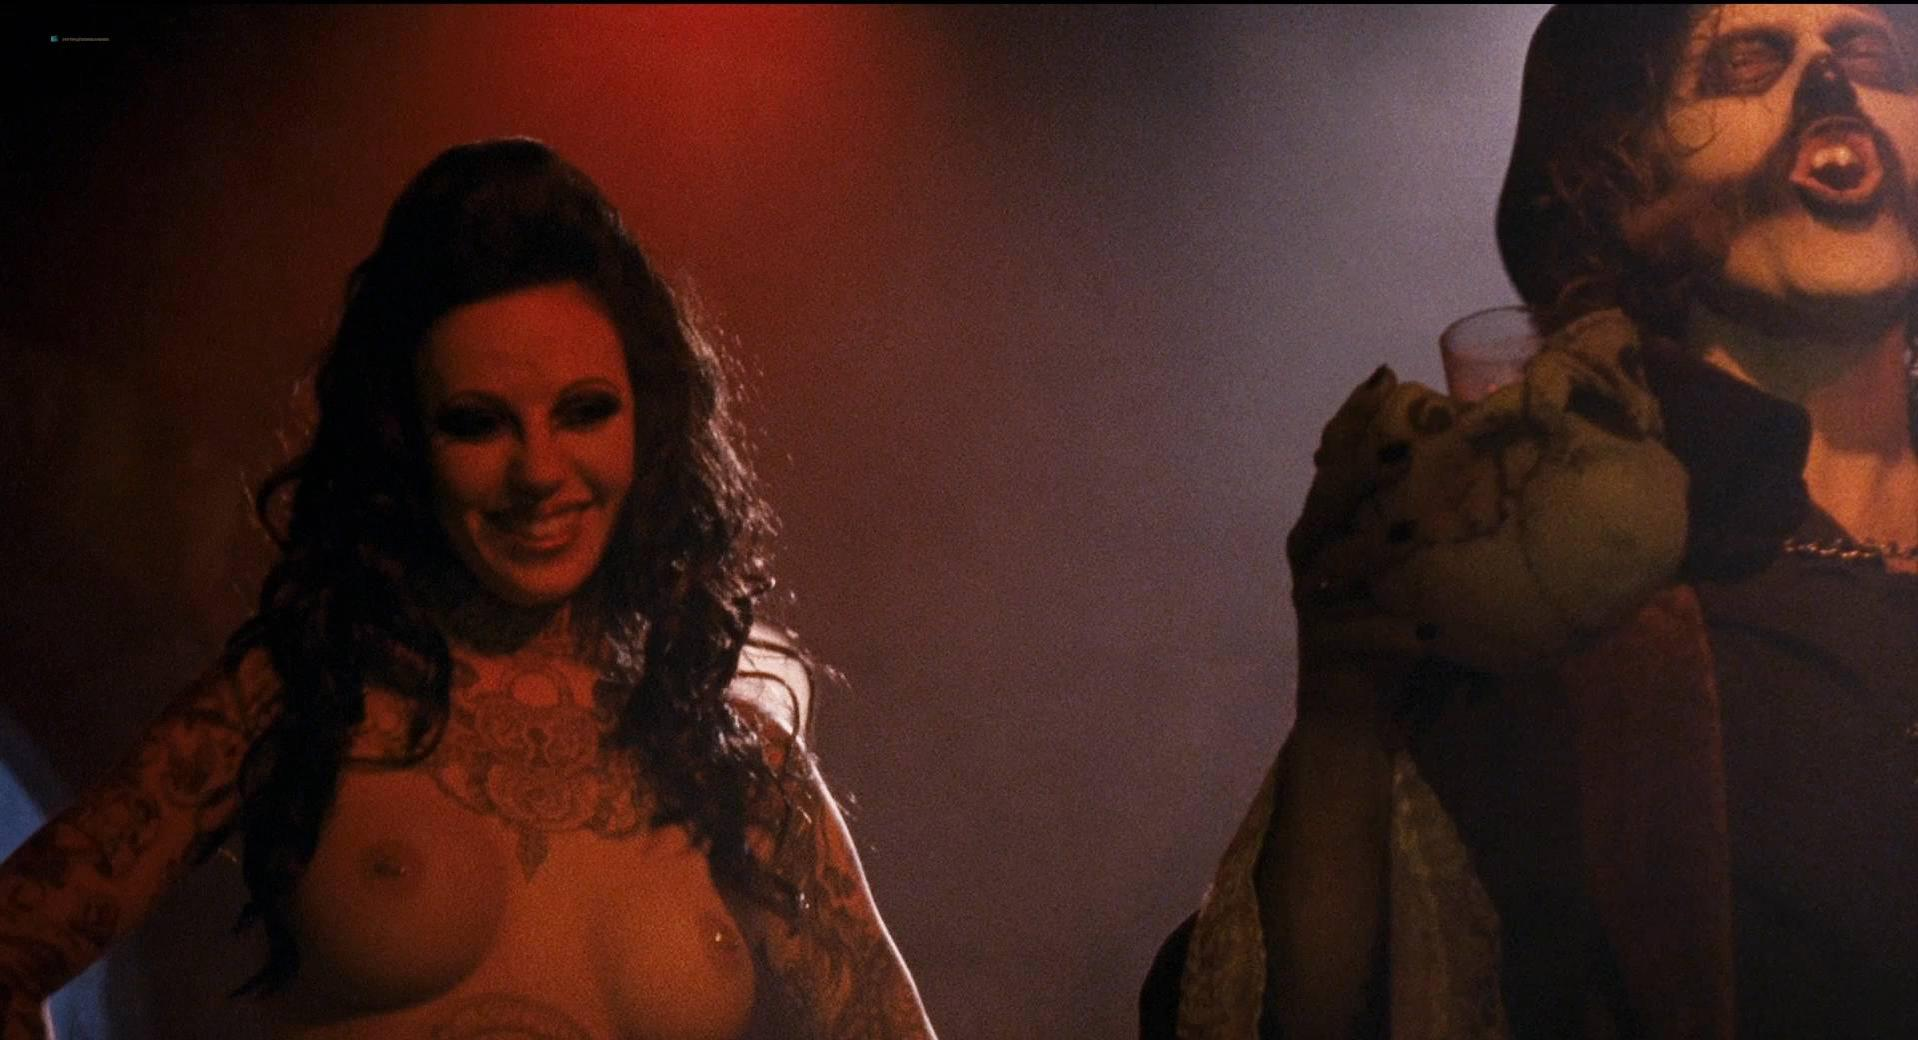 Danielle Harris nude, Sylvia Jefferies nude - Halloween 2 (2009)